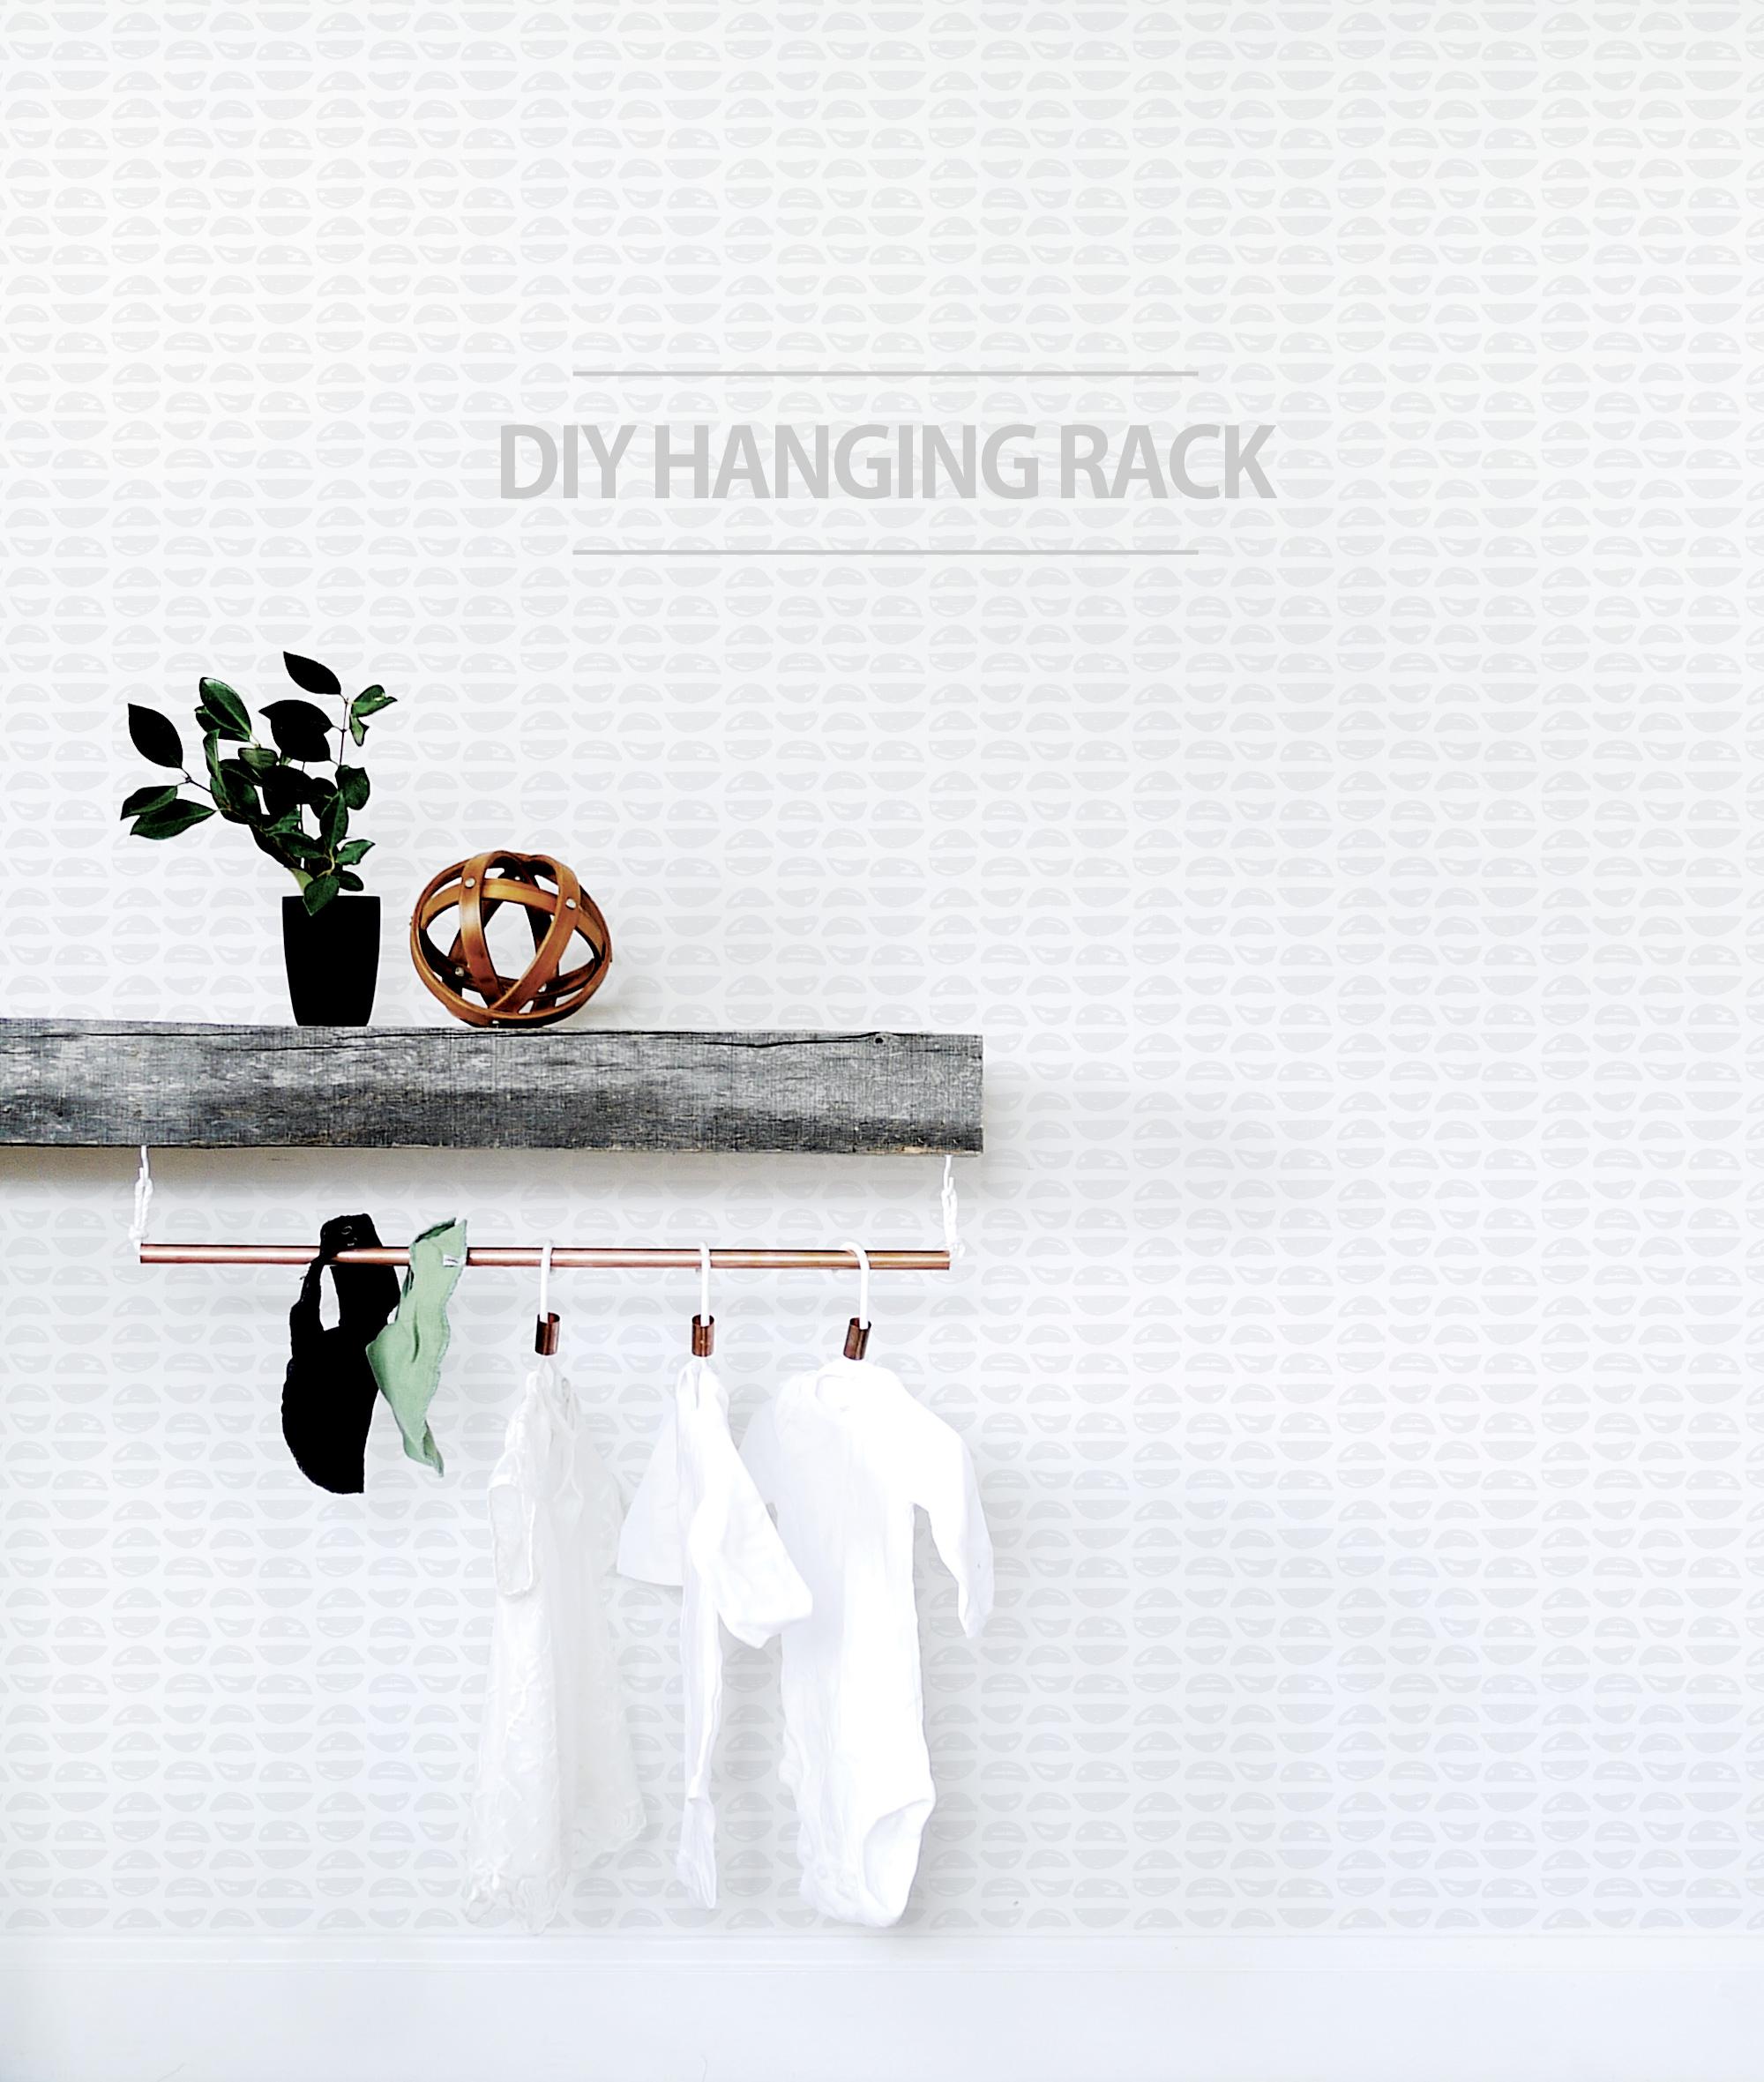 DIY Hanging Rack for the Nursery Copper Pipe DIY Hanging Organizer